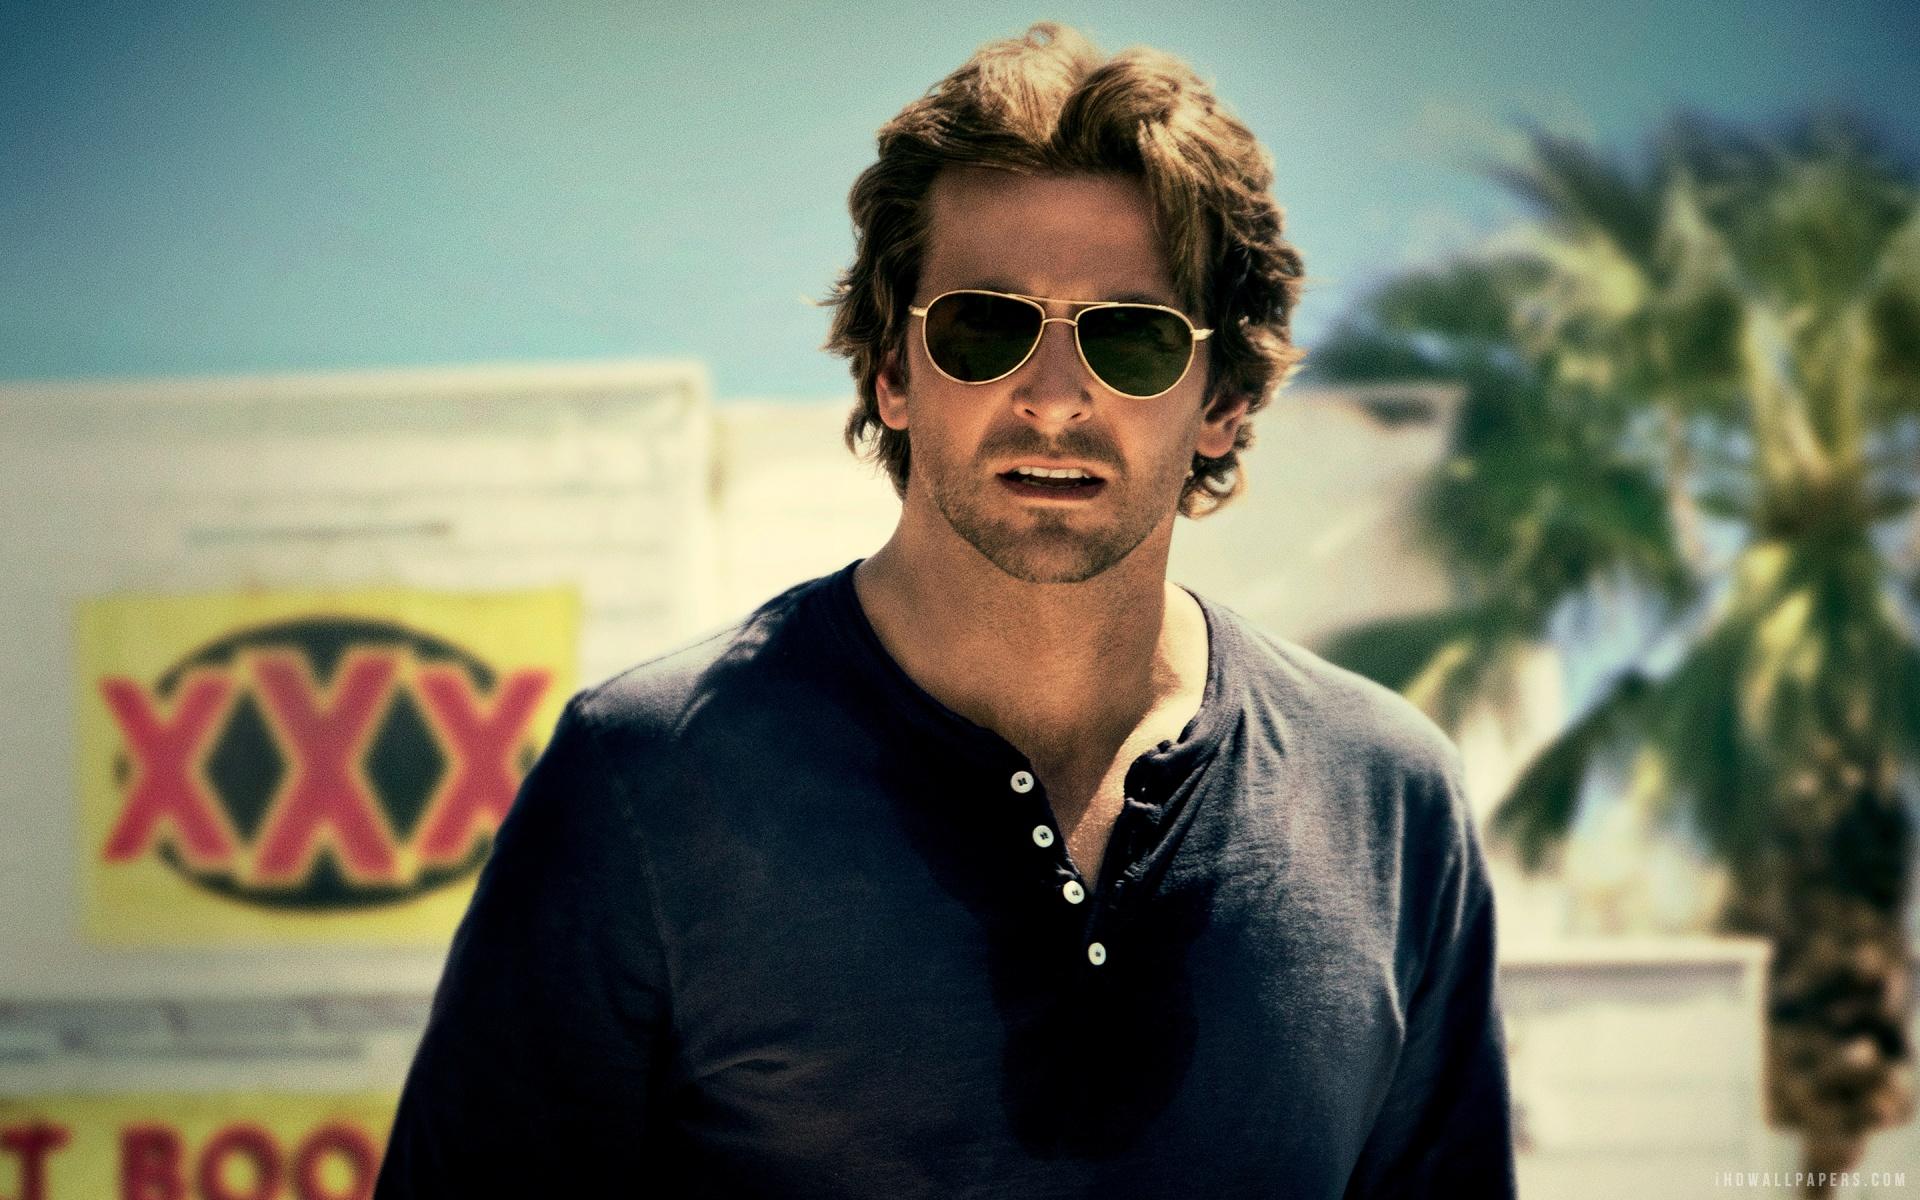 Bradley Cooper in The Hangover Part 3 HD Wallpaper   iHD Wallpapers 1920x1200